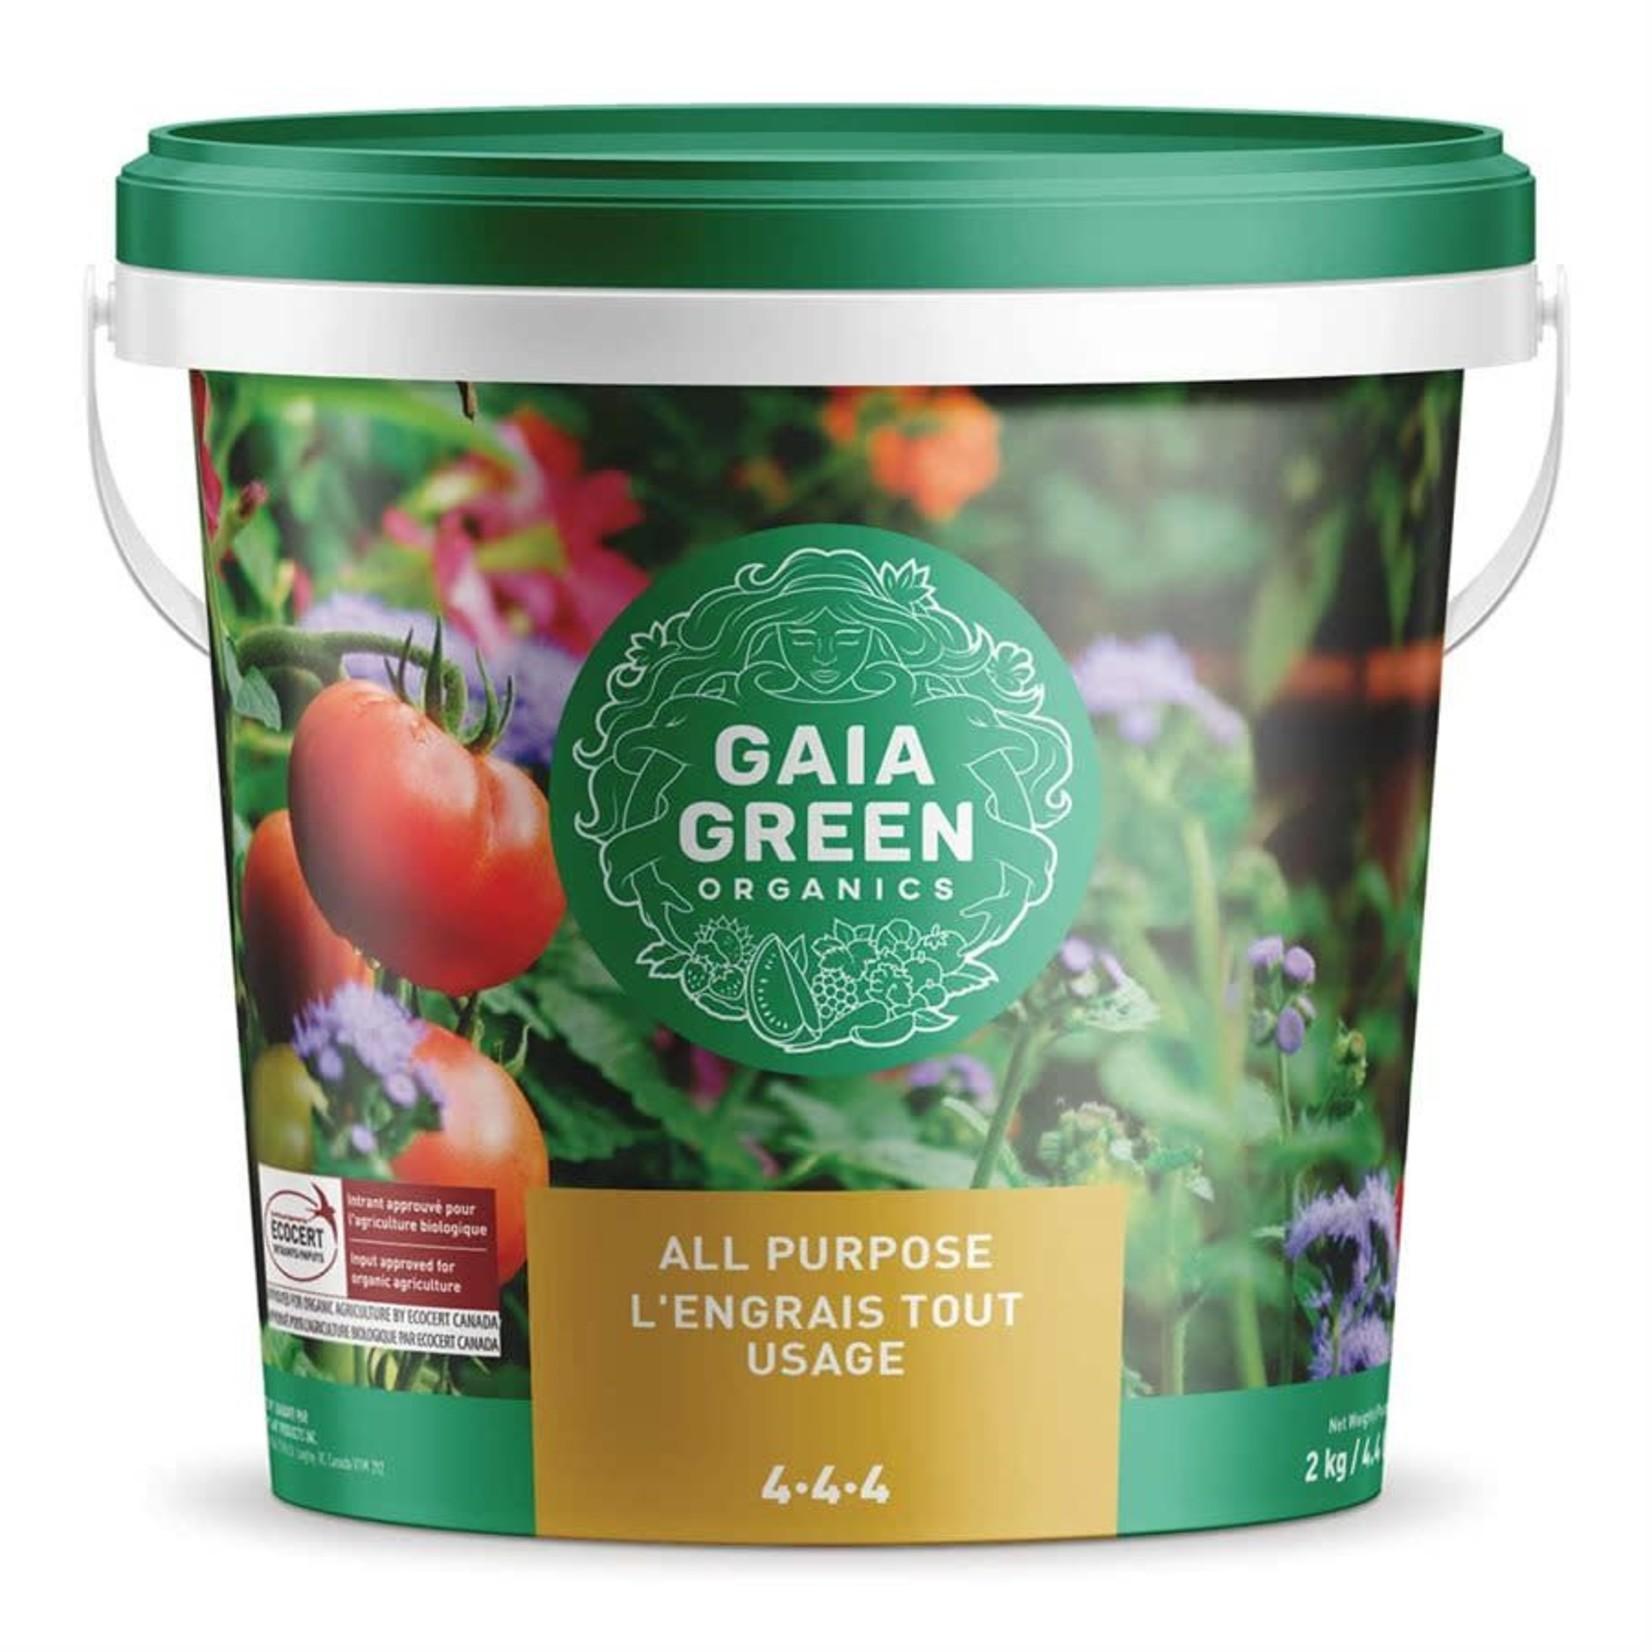 Gaia Green All Purpose 4-4-4, 2kg